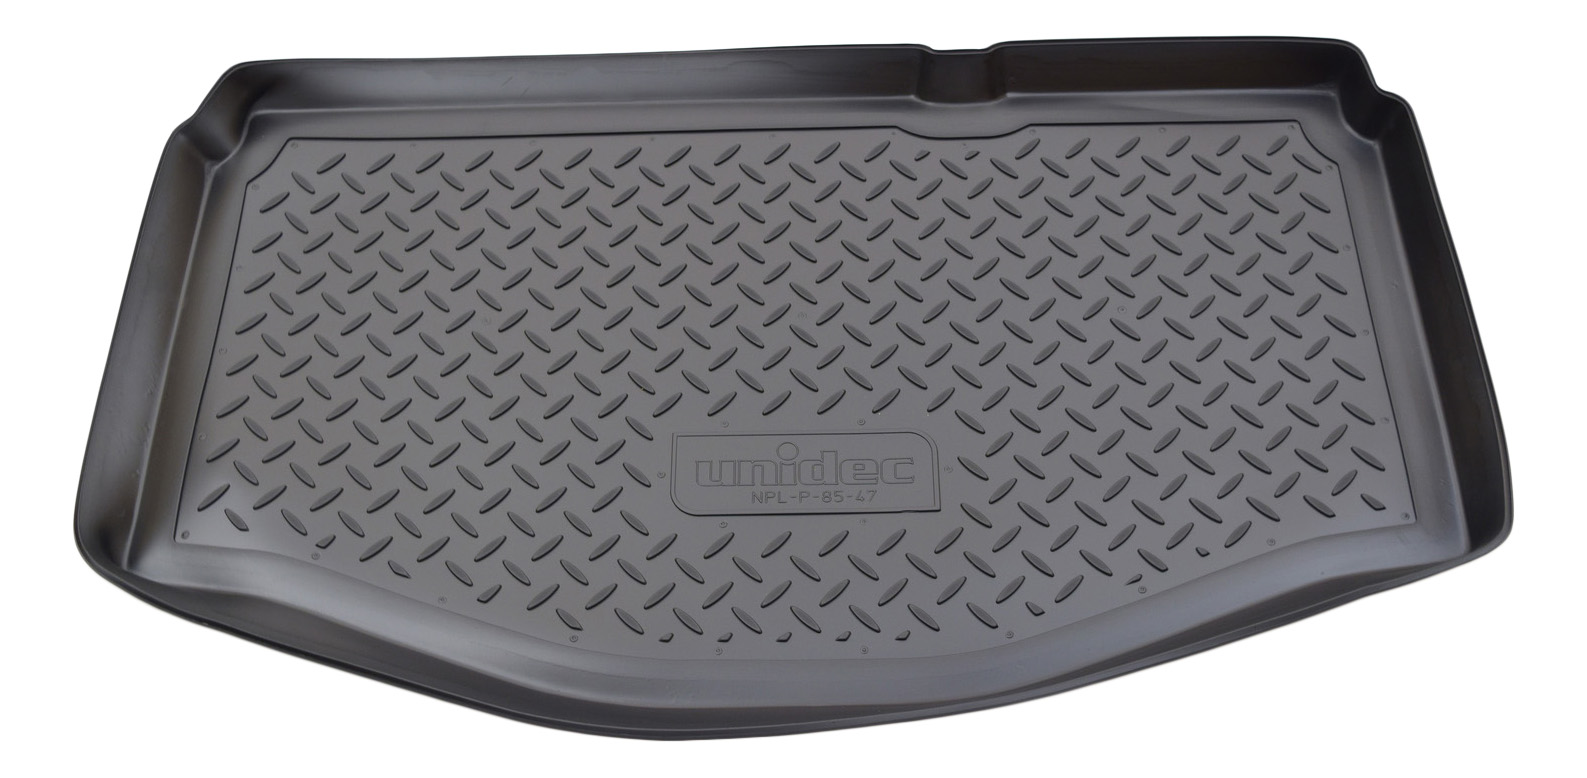 Коврик в багажник автомобиля для Suzuki Norplast (NPL-P-85-47) фото